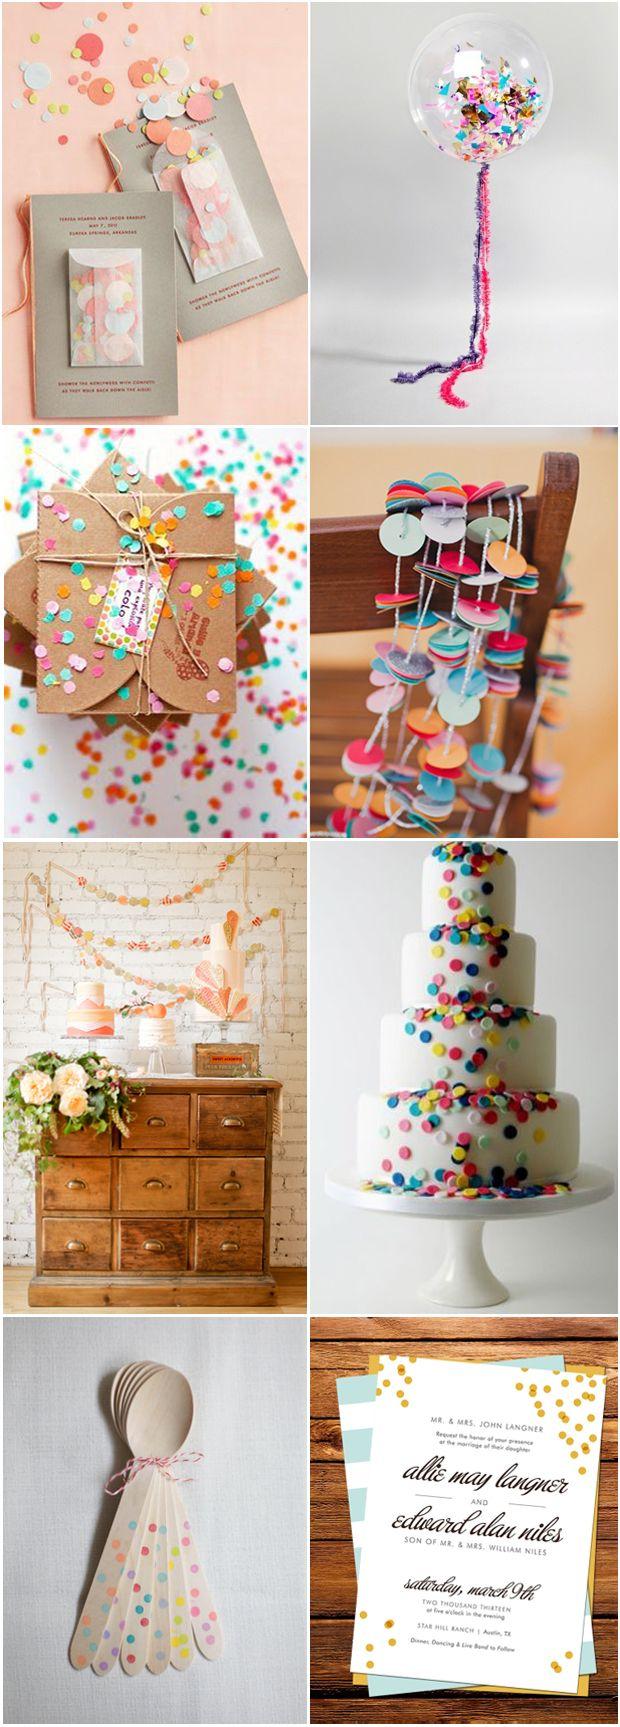 Confetti Inspiration Palette | weddingsonline